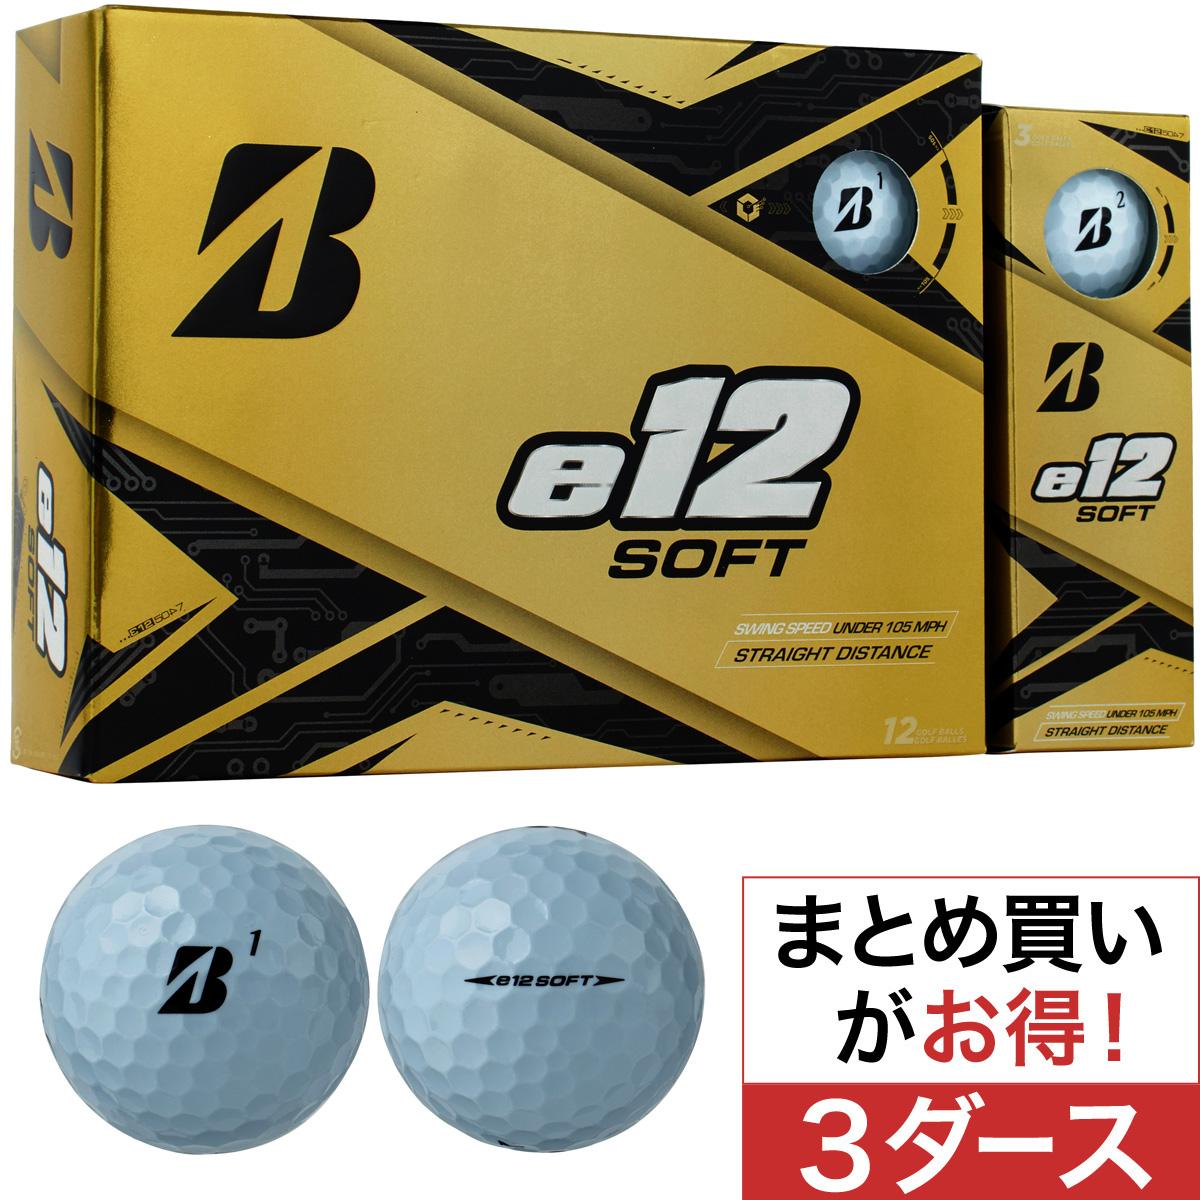 e12 SOFT ボール 3ダースセット